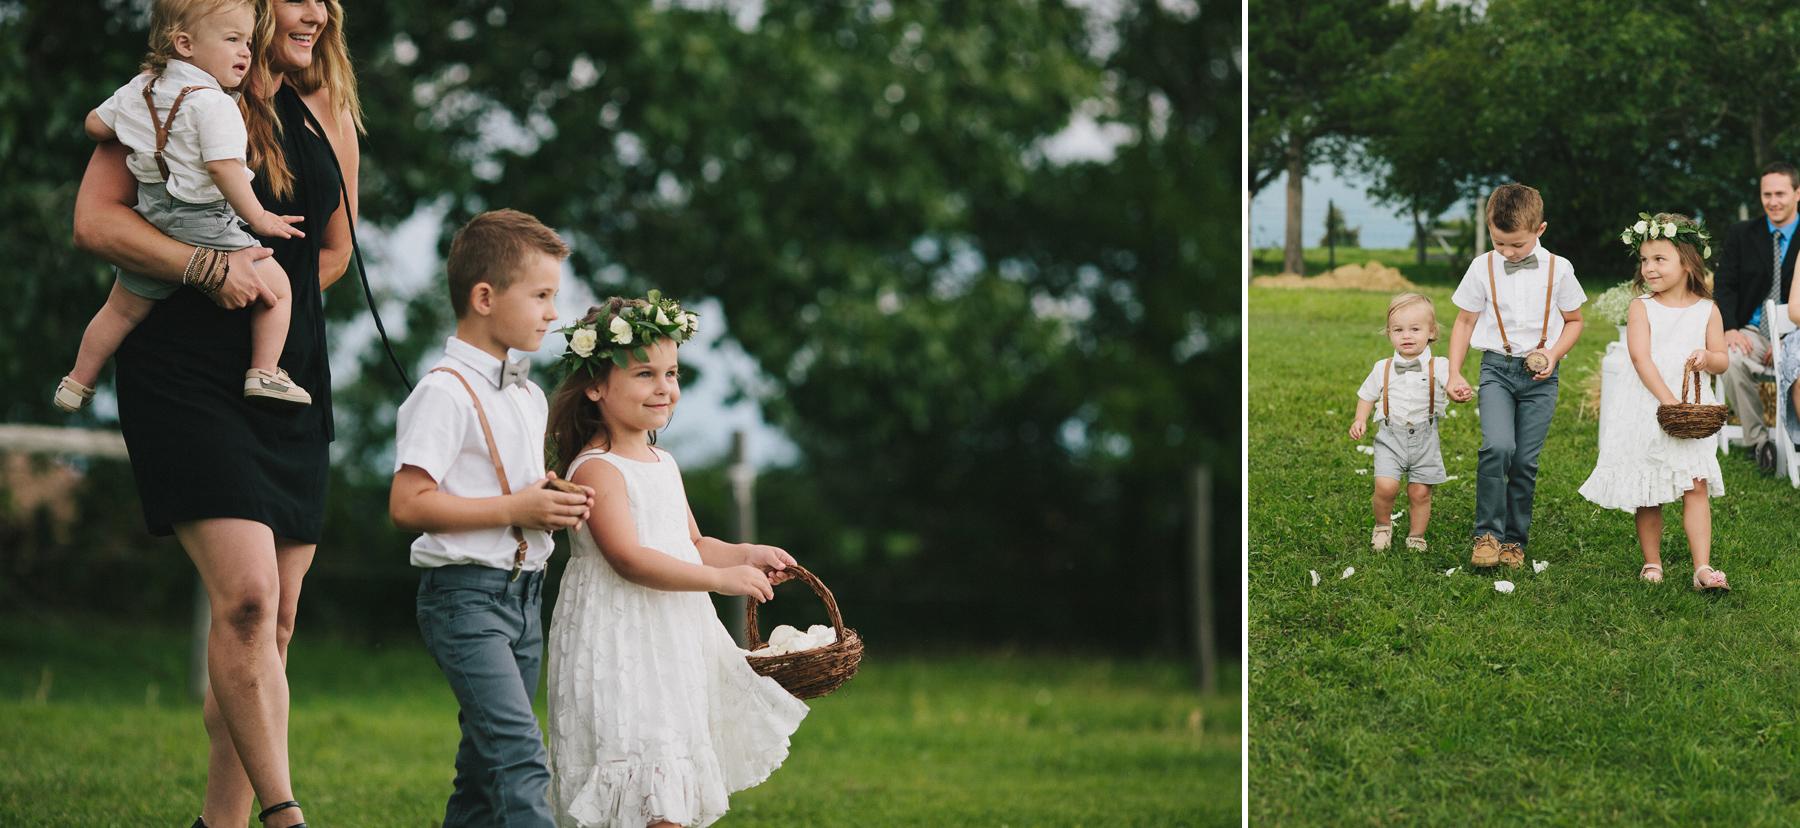 alberta-farm-wedding-photographer-rp-wj-097.jpg